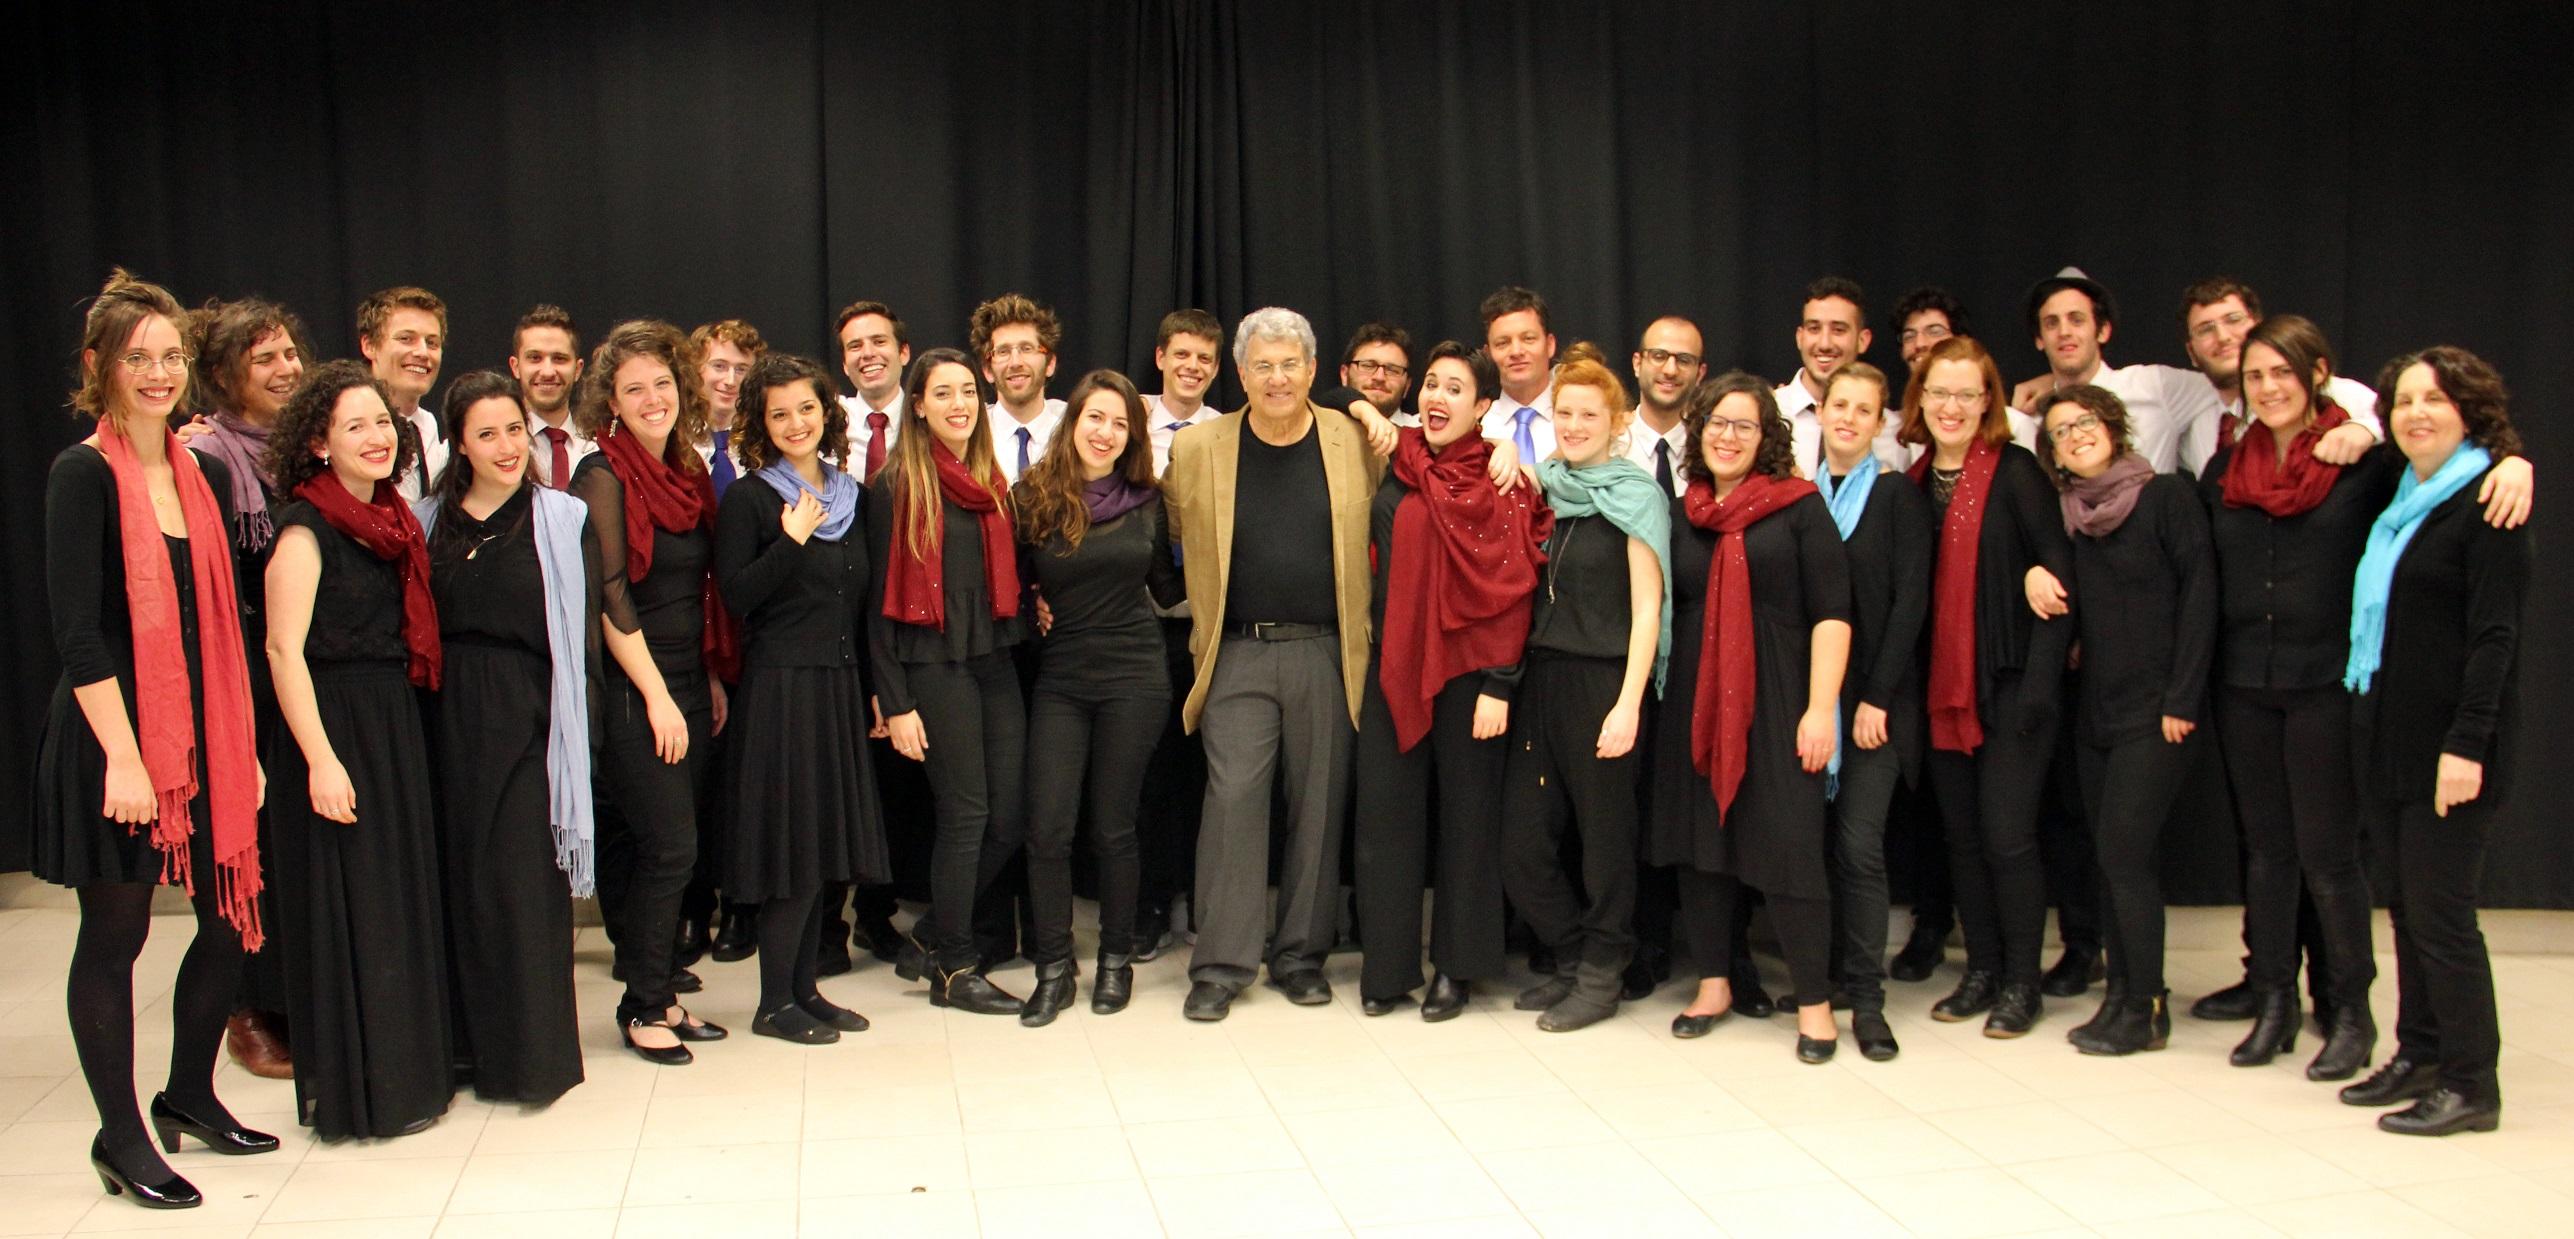 Камерный хор Иерусалимской Академии музыки и танца. Фото: Йонатан Дрор